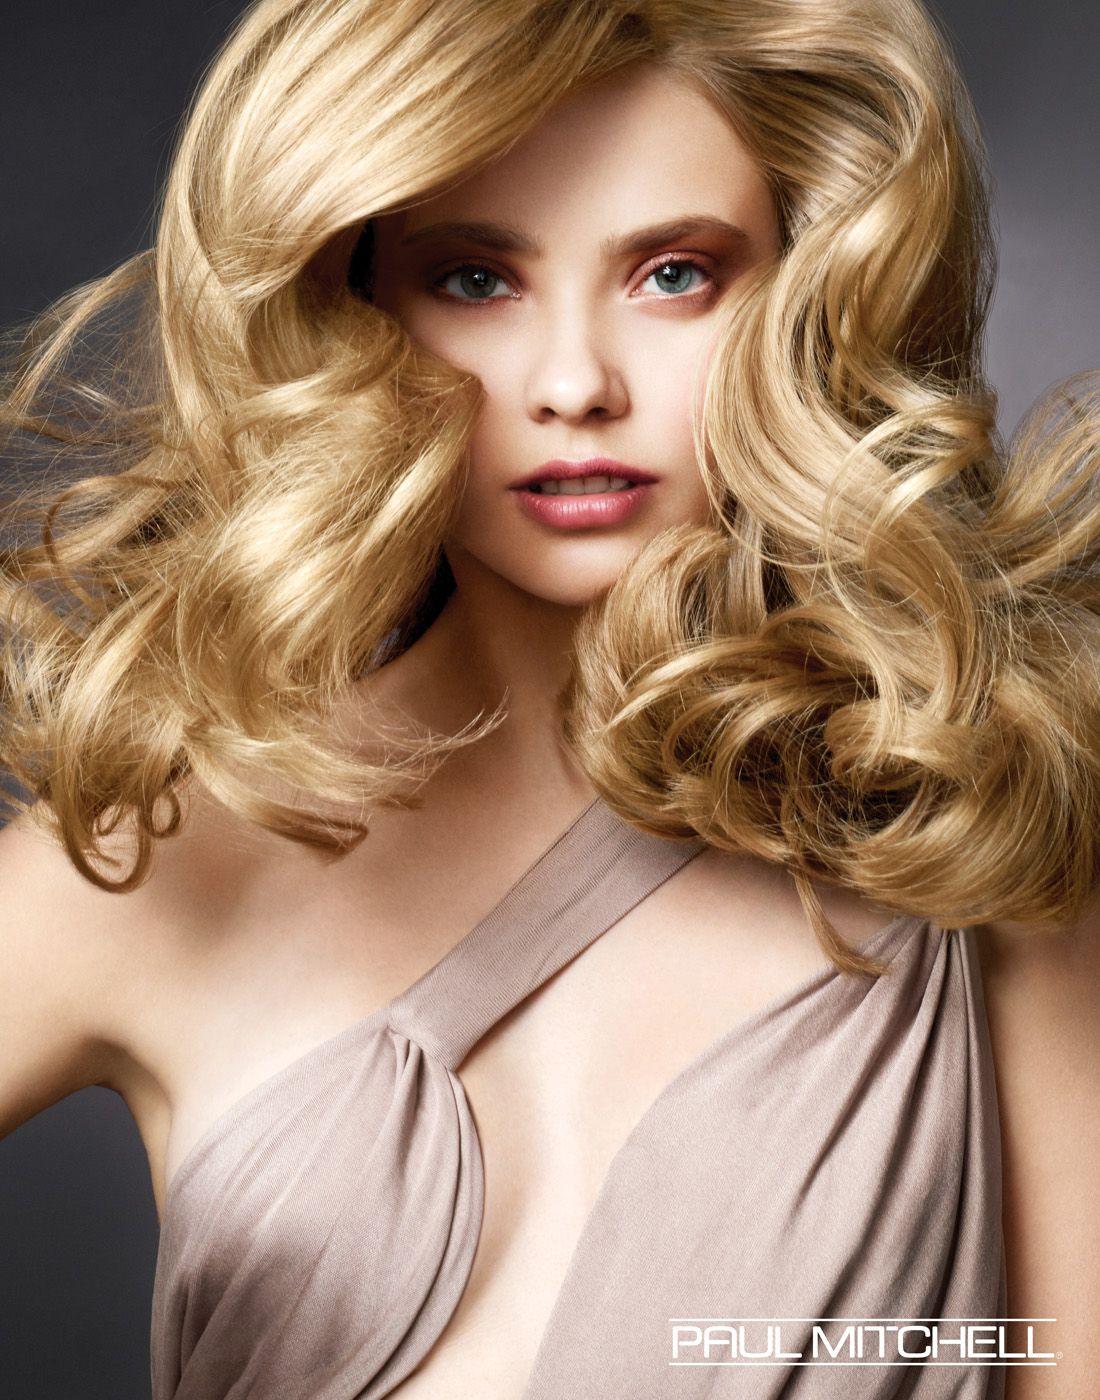 paul mitchell Google Search Blonde hair makeup